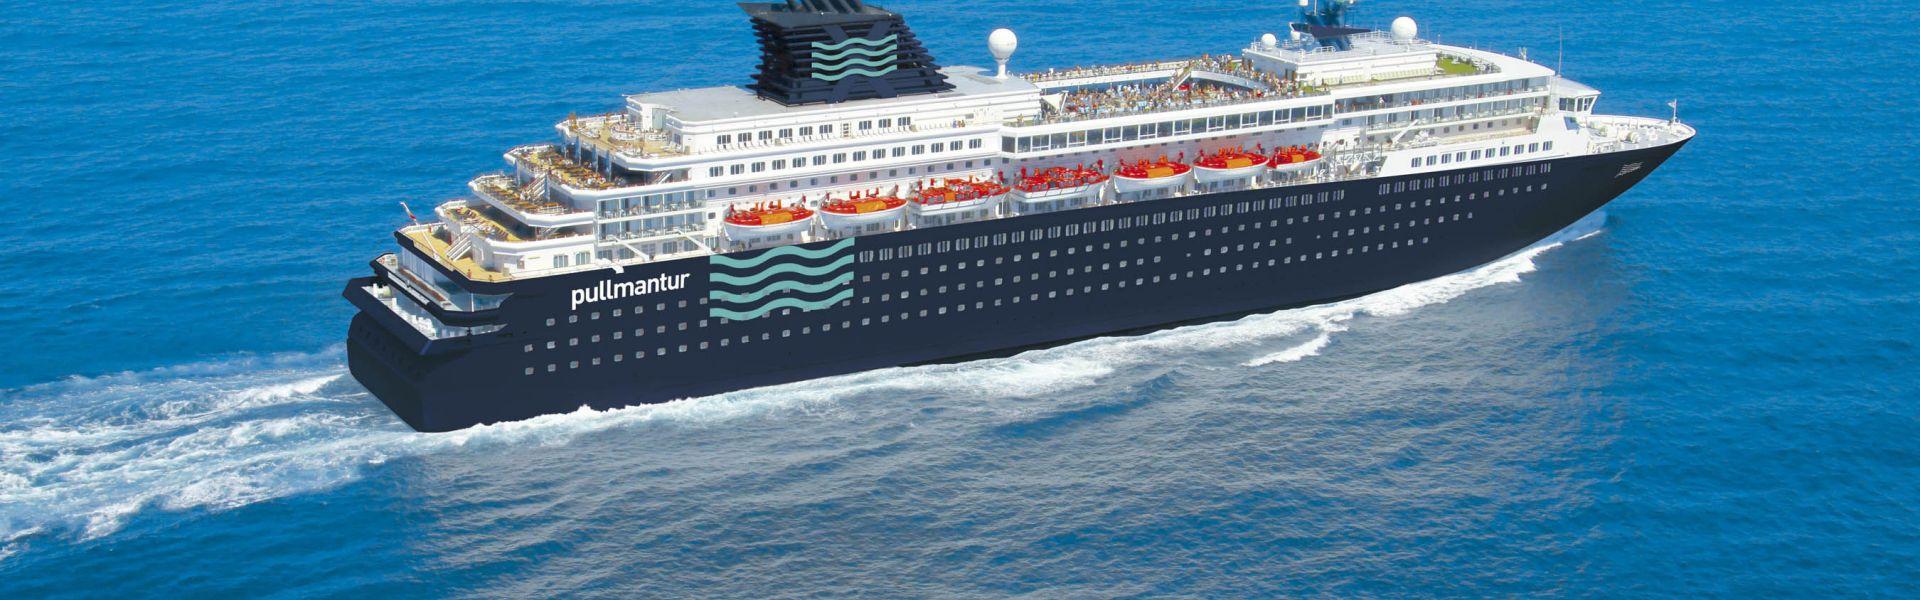 Croaziera 2017 - Mediterana de Vest (Alicante) - Pullmantur Cruises - Horizon - 7 nopti